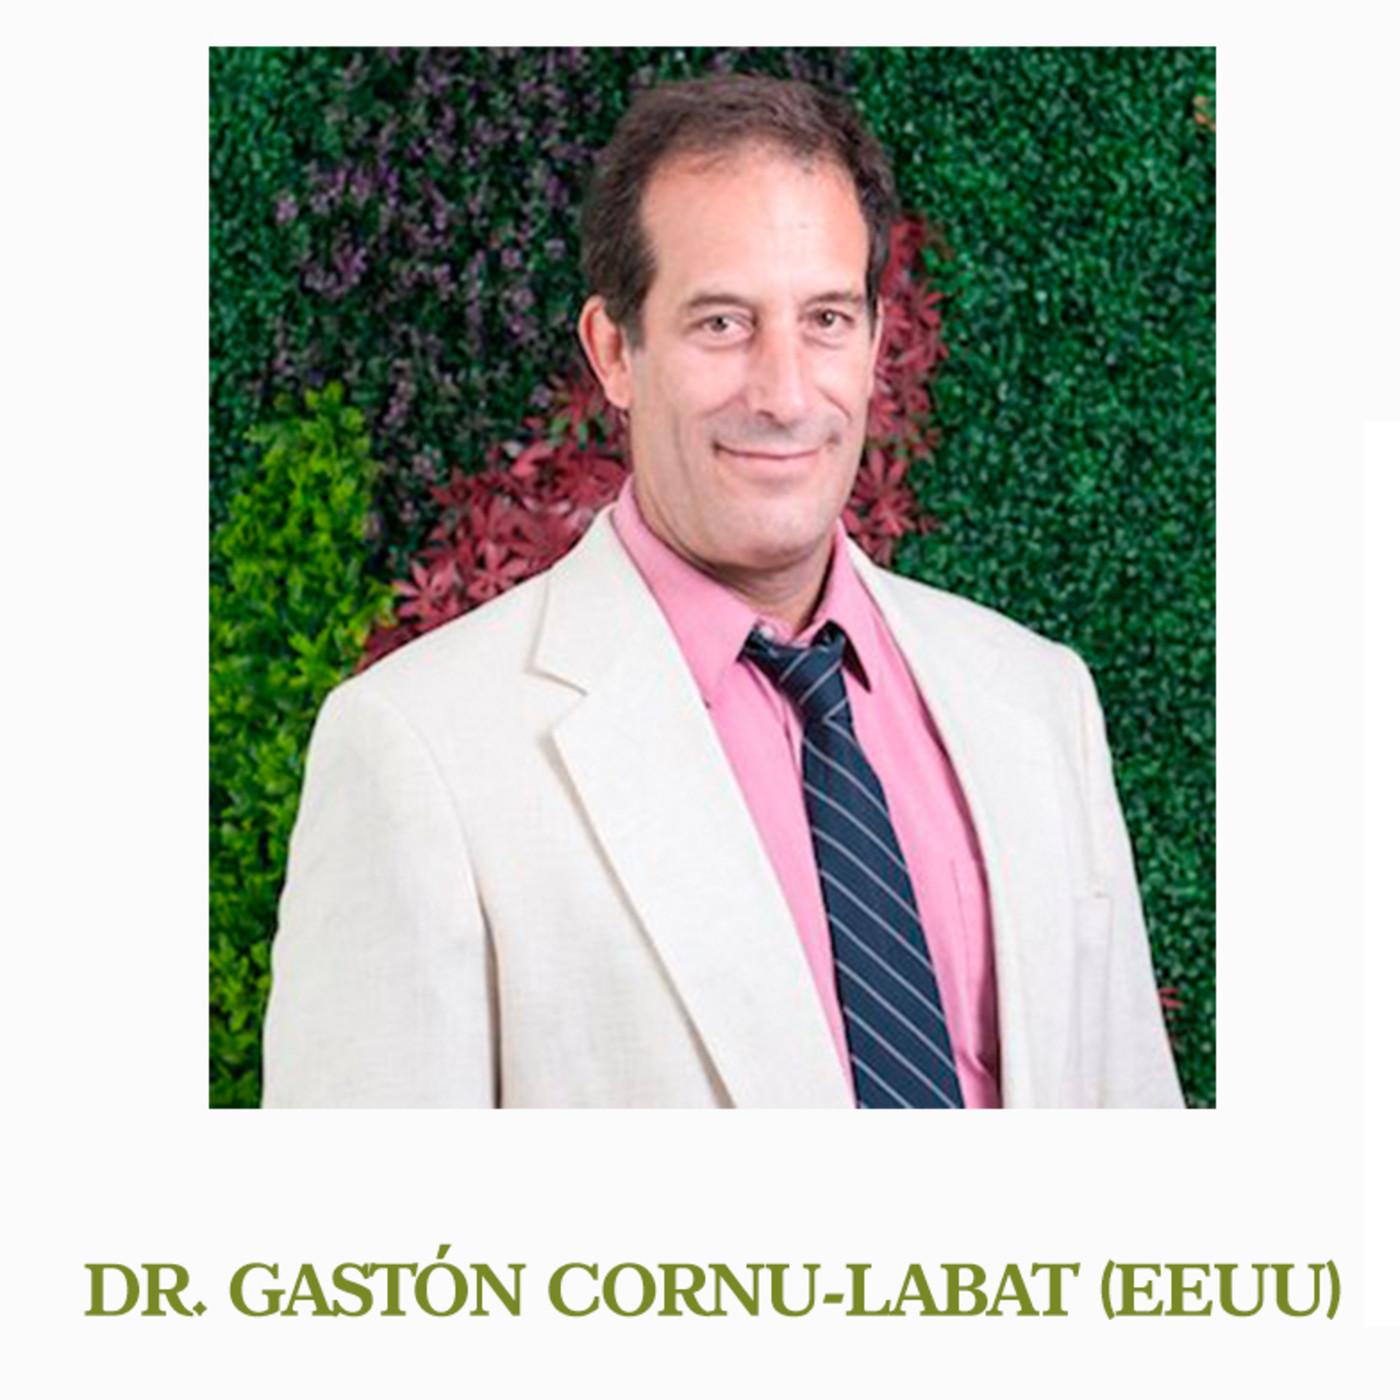 Gaston Cornu